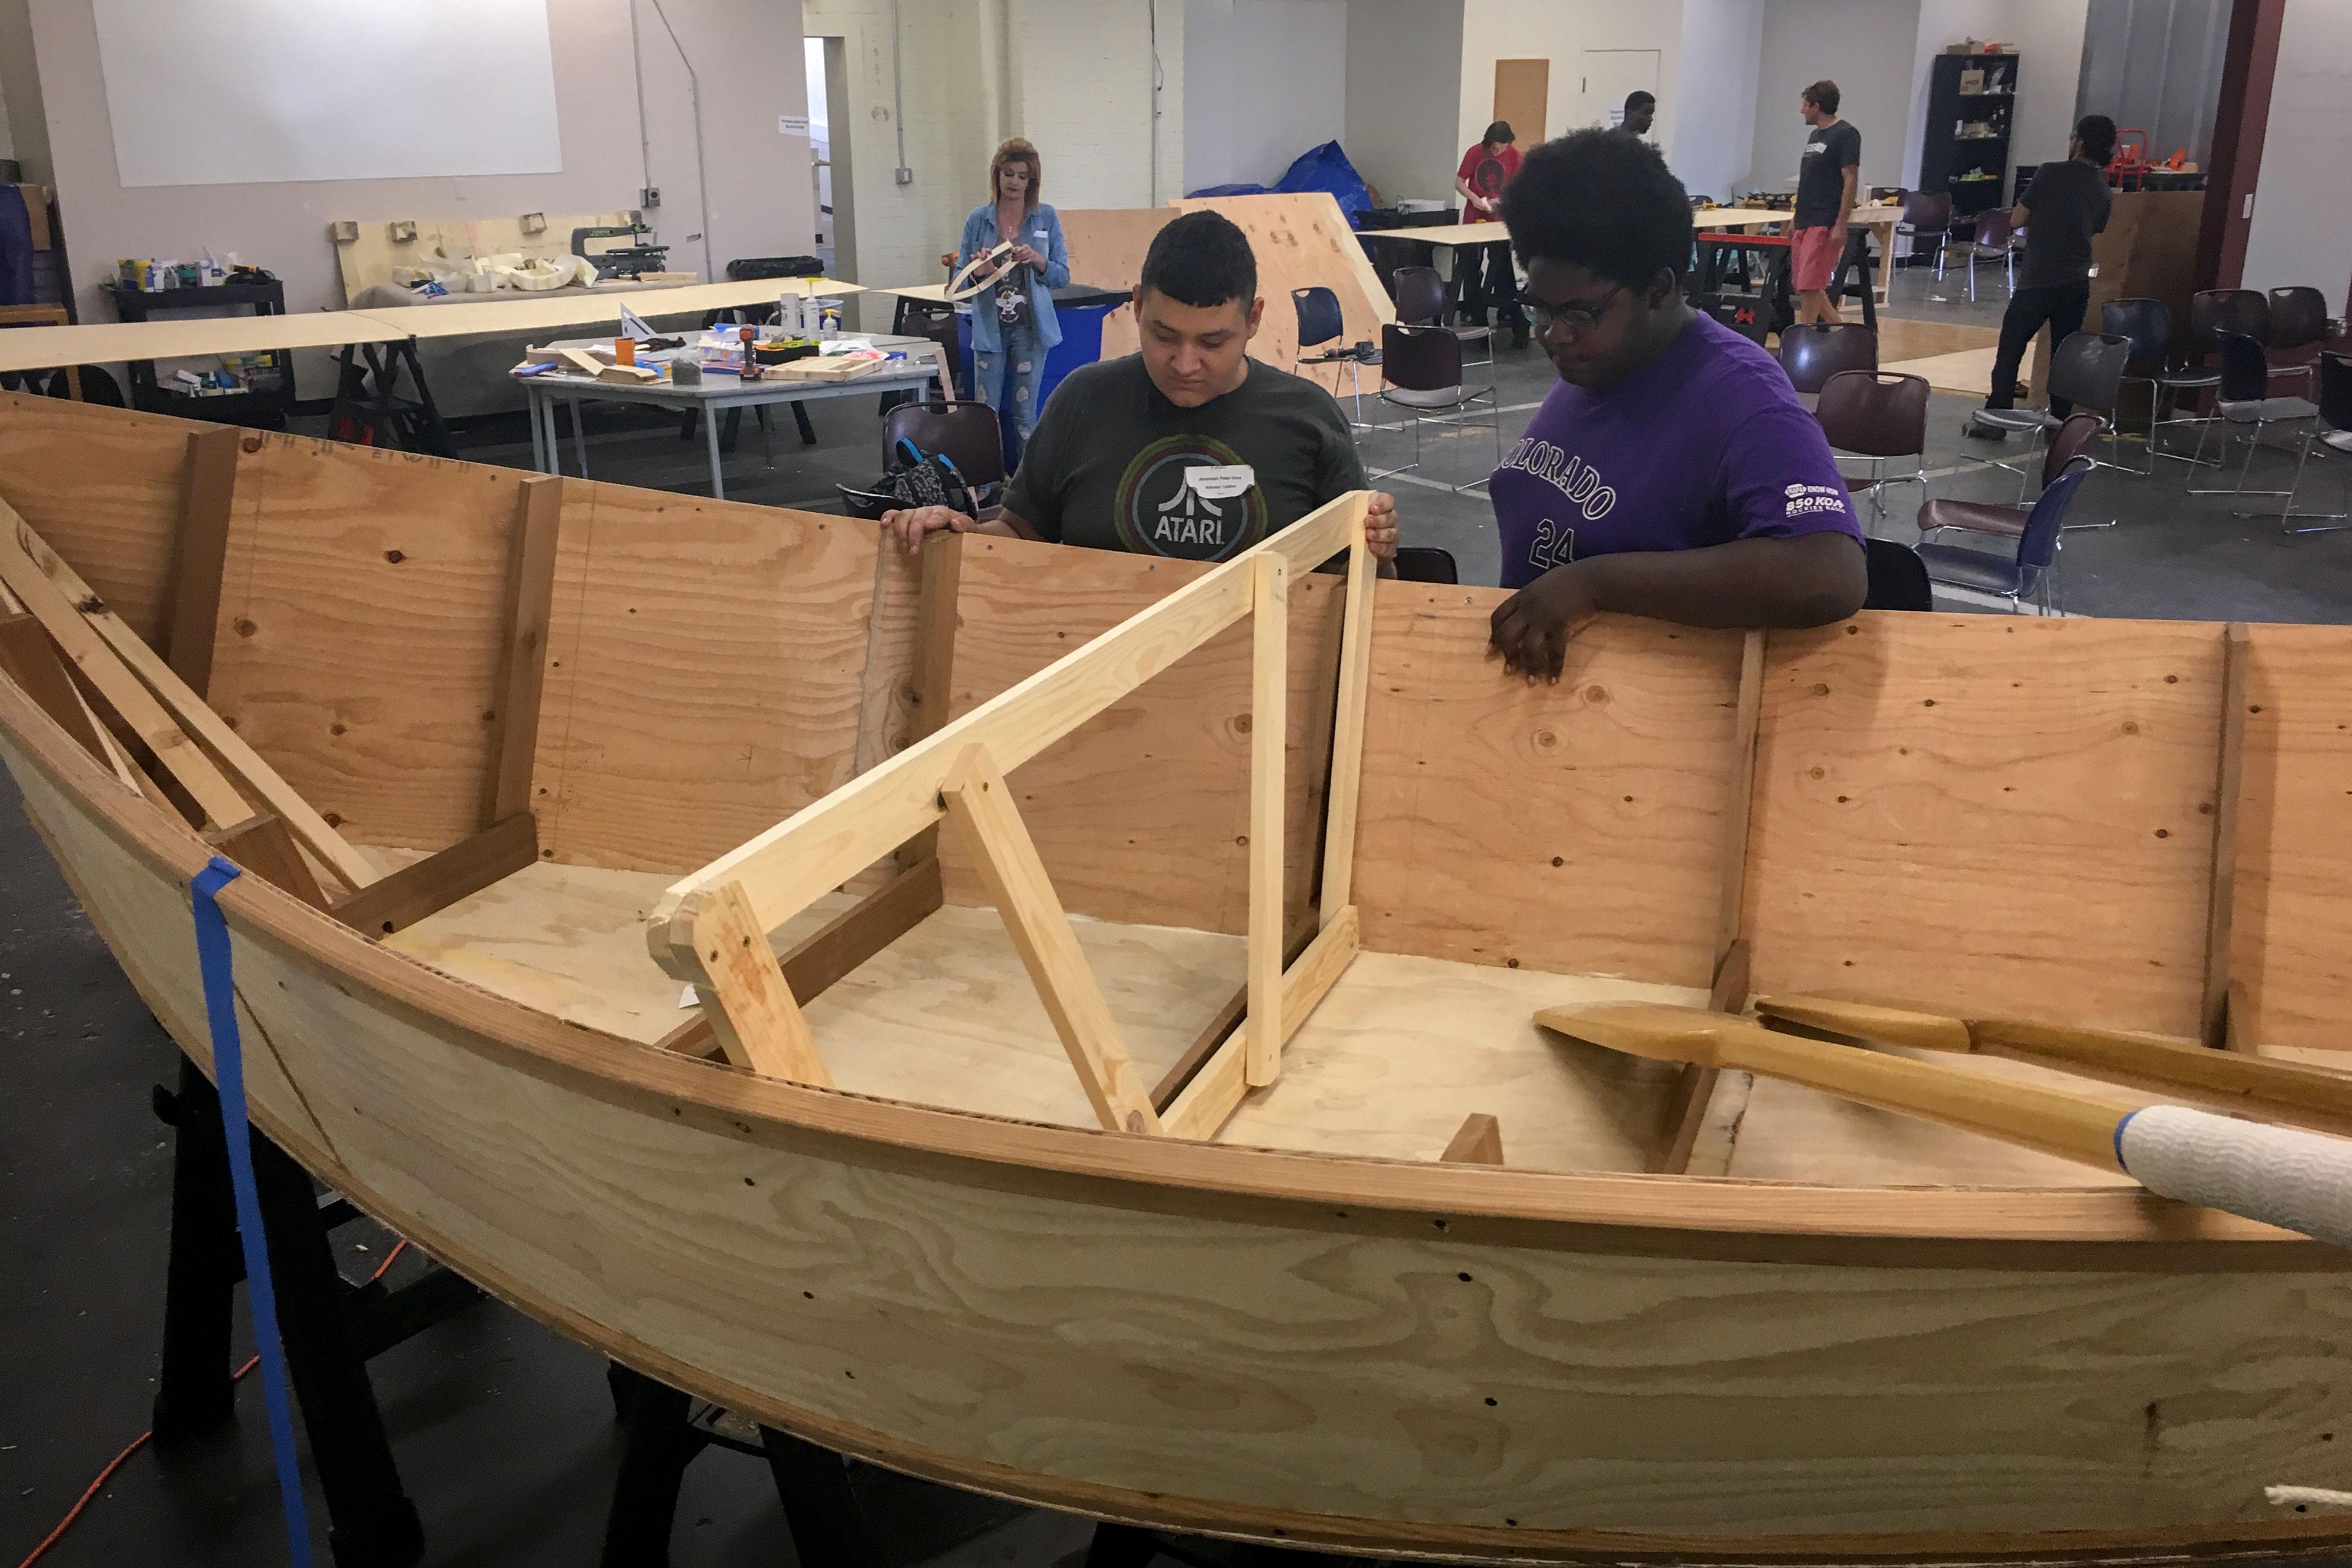 Photo: 5280 HS 1 | Boat Work - JDaley